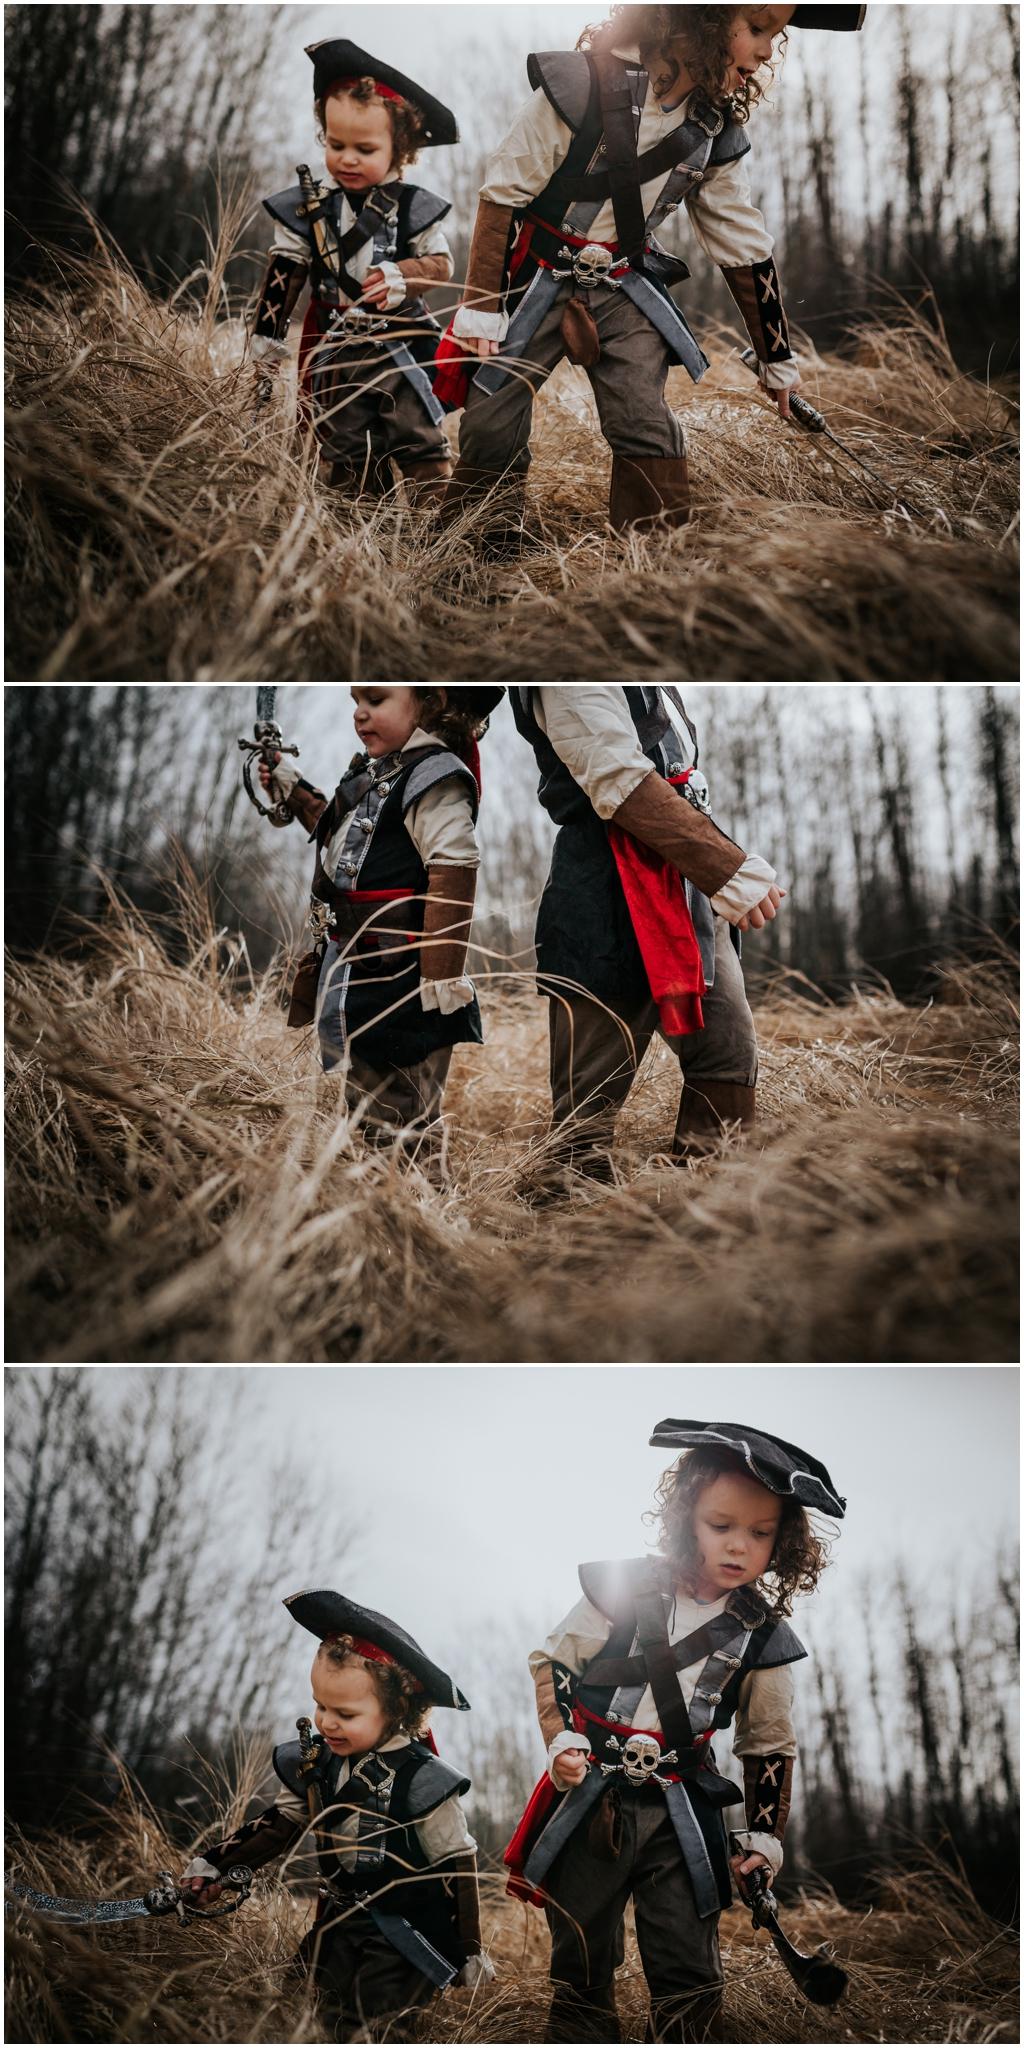 Alberta Child Photographer - Pirate Costume Halloween Lifestyle Documentary Photography YEG